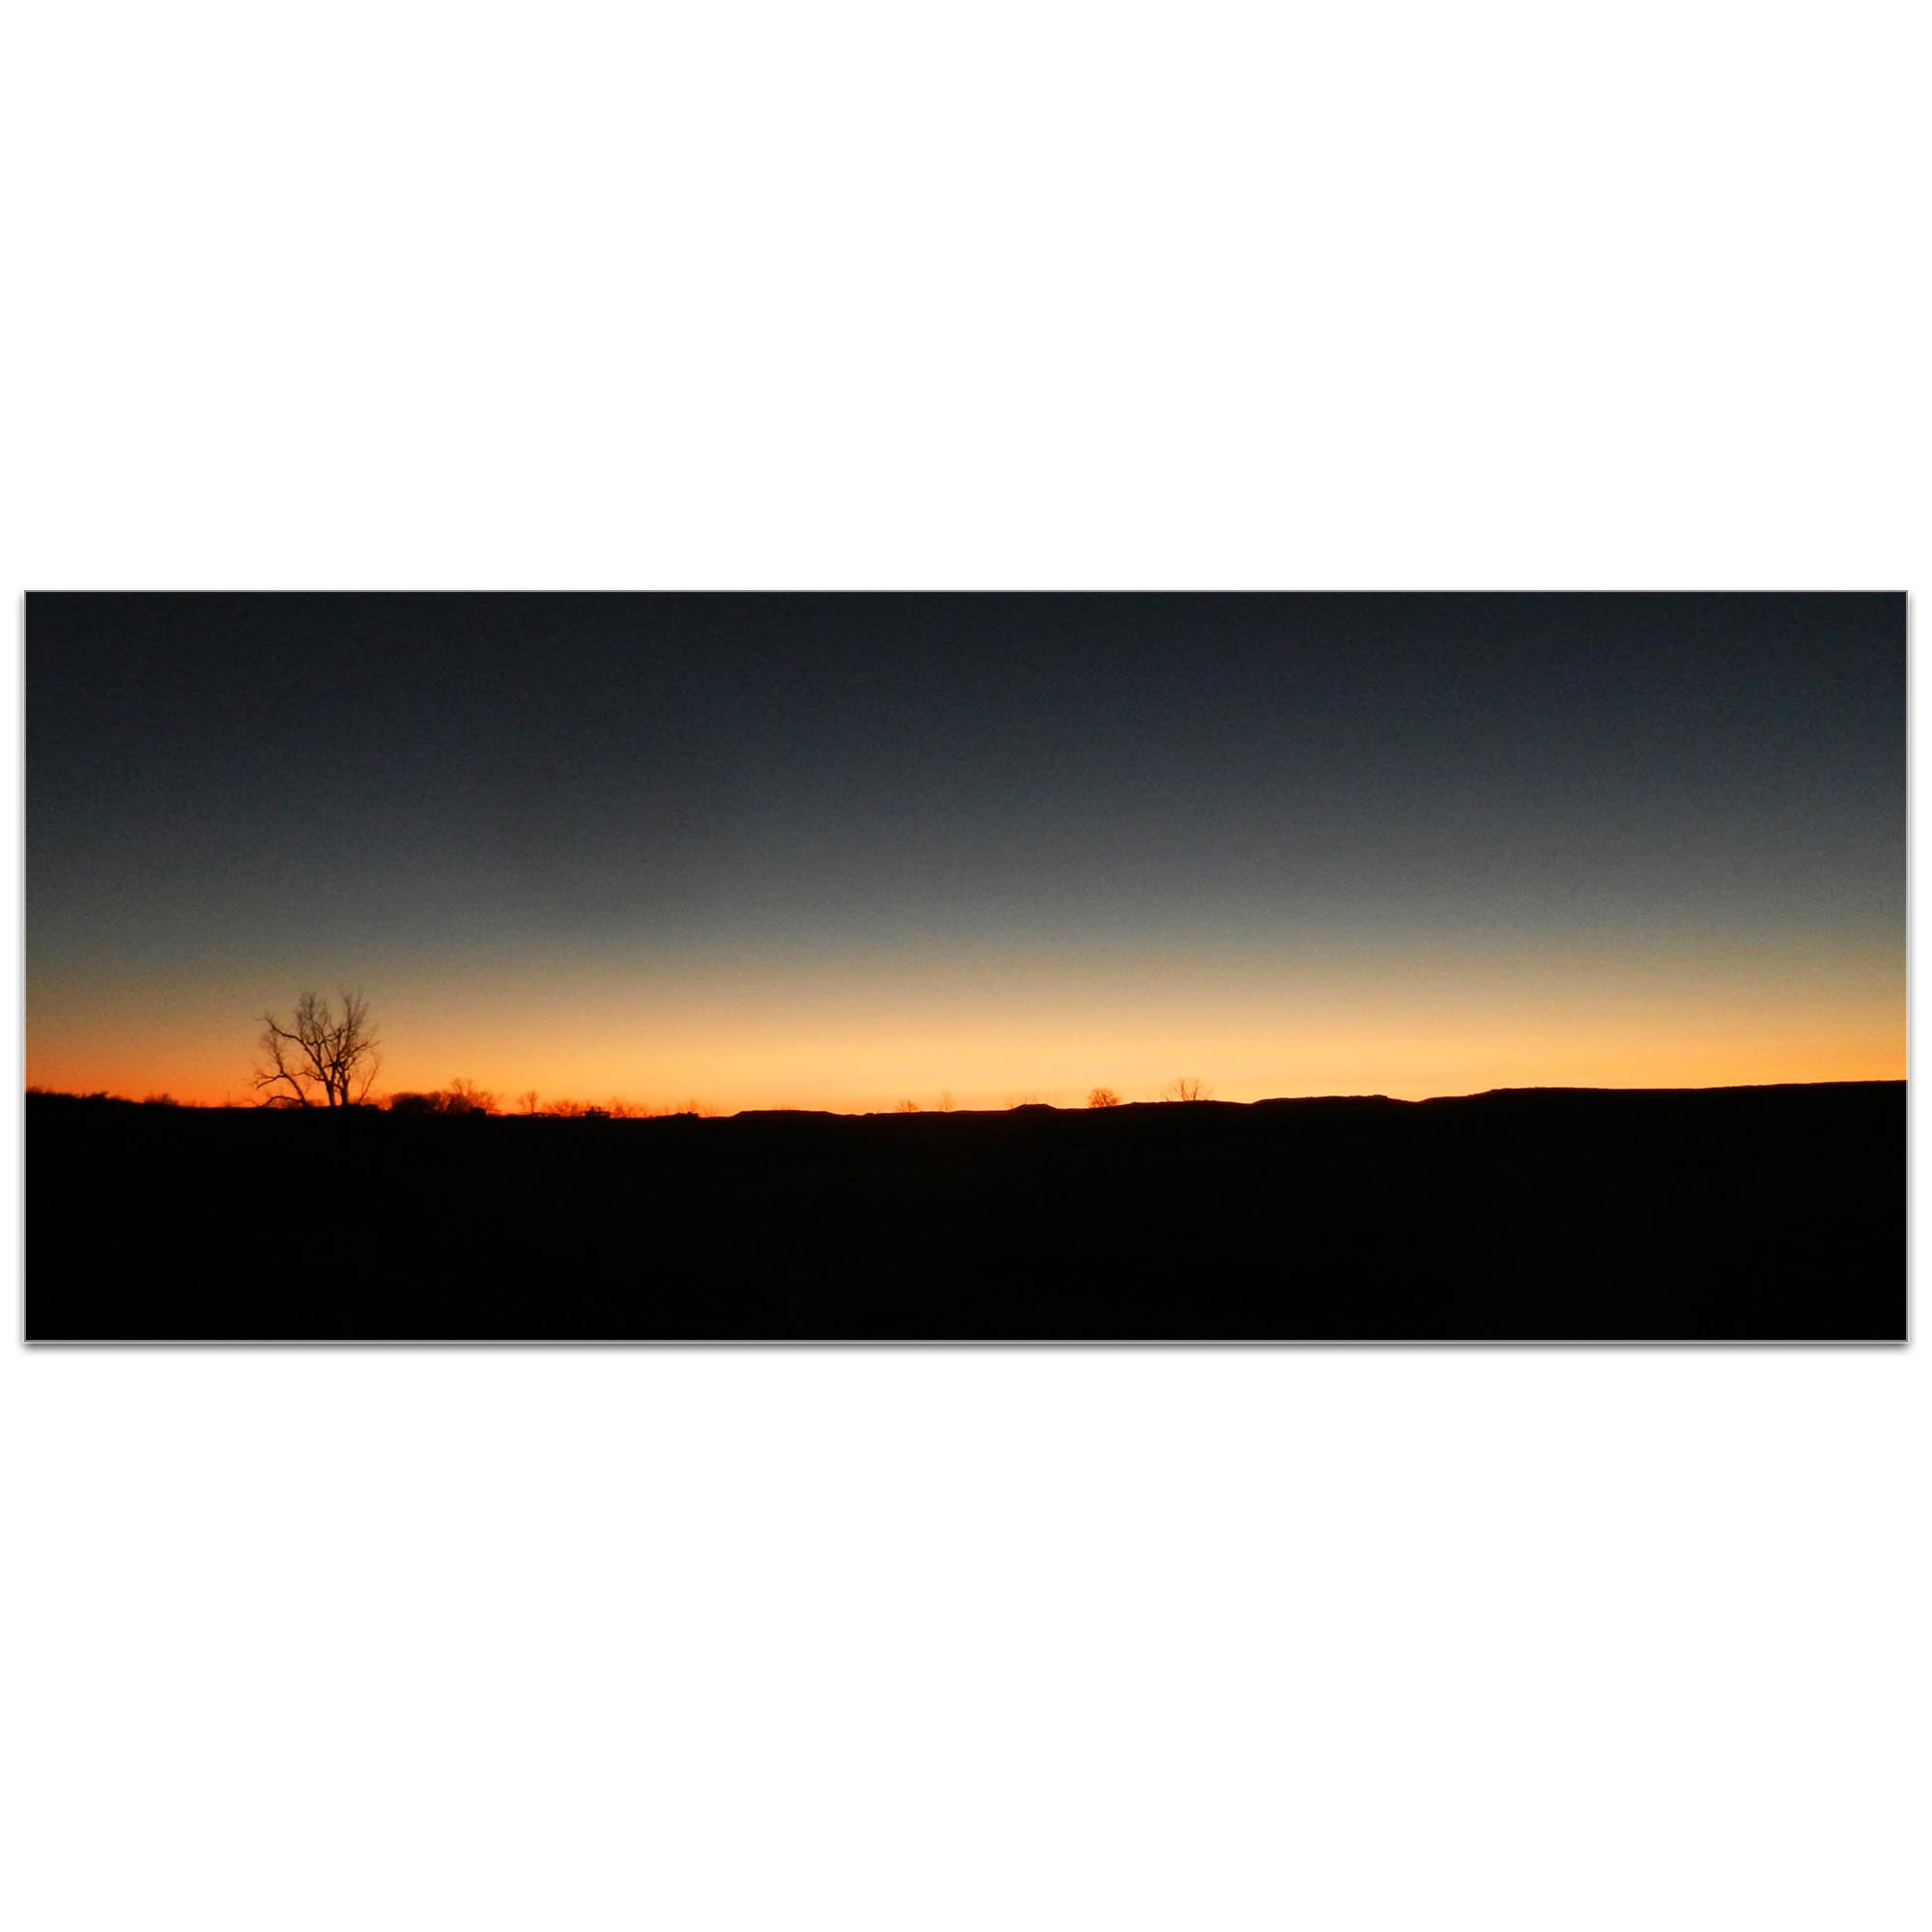 Western Wall Art 'Desert Sunset' - American West Decor on Metal or Plexiglass - Image 2